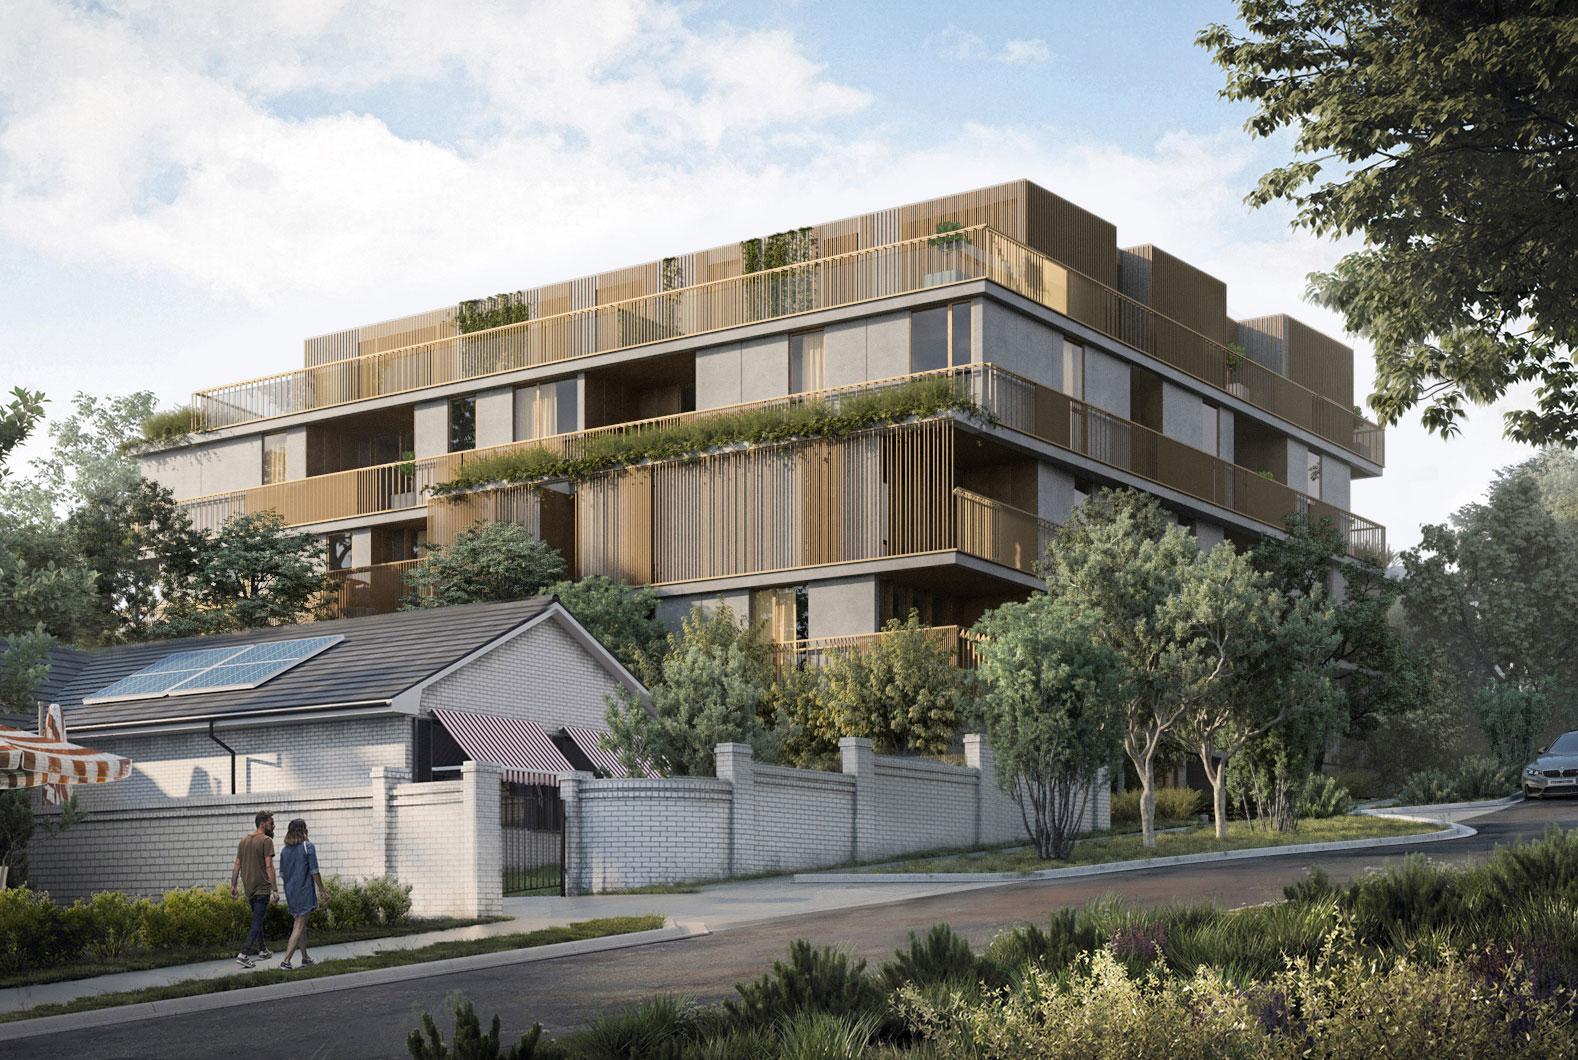 Low Carbon Housing - Melbourne - DROO Architects